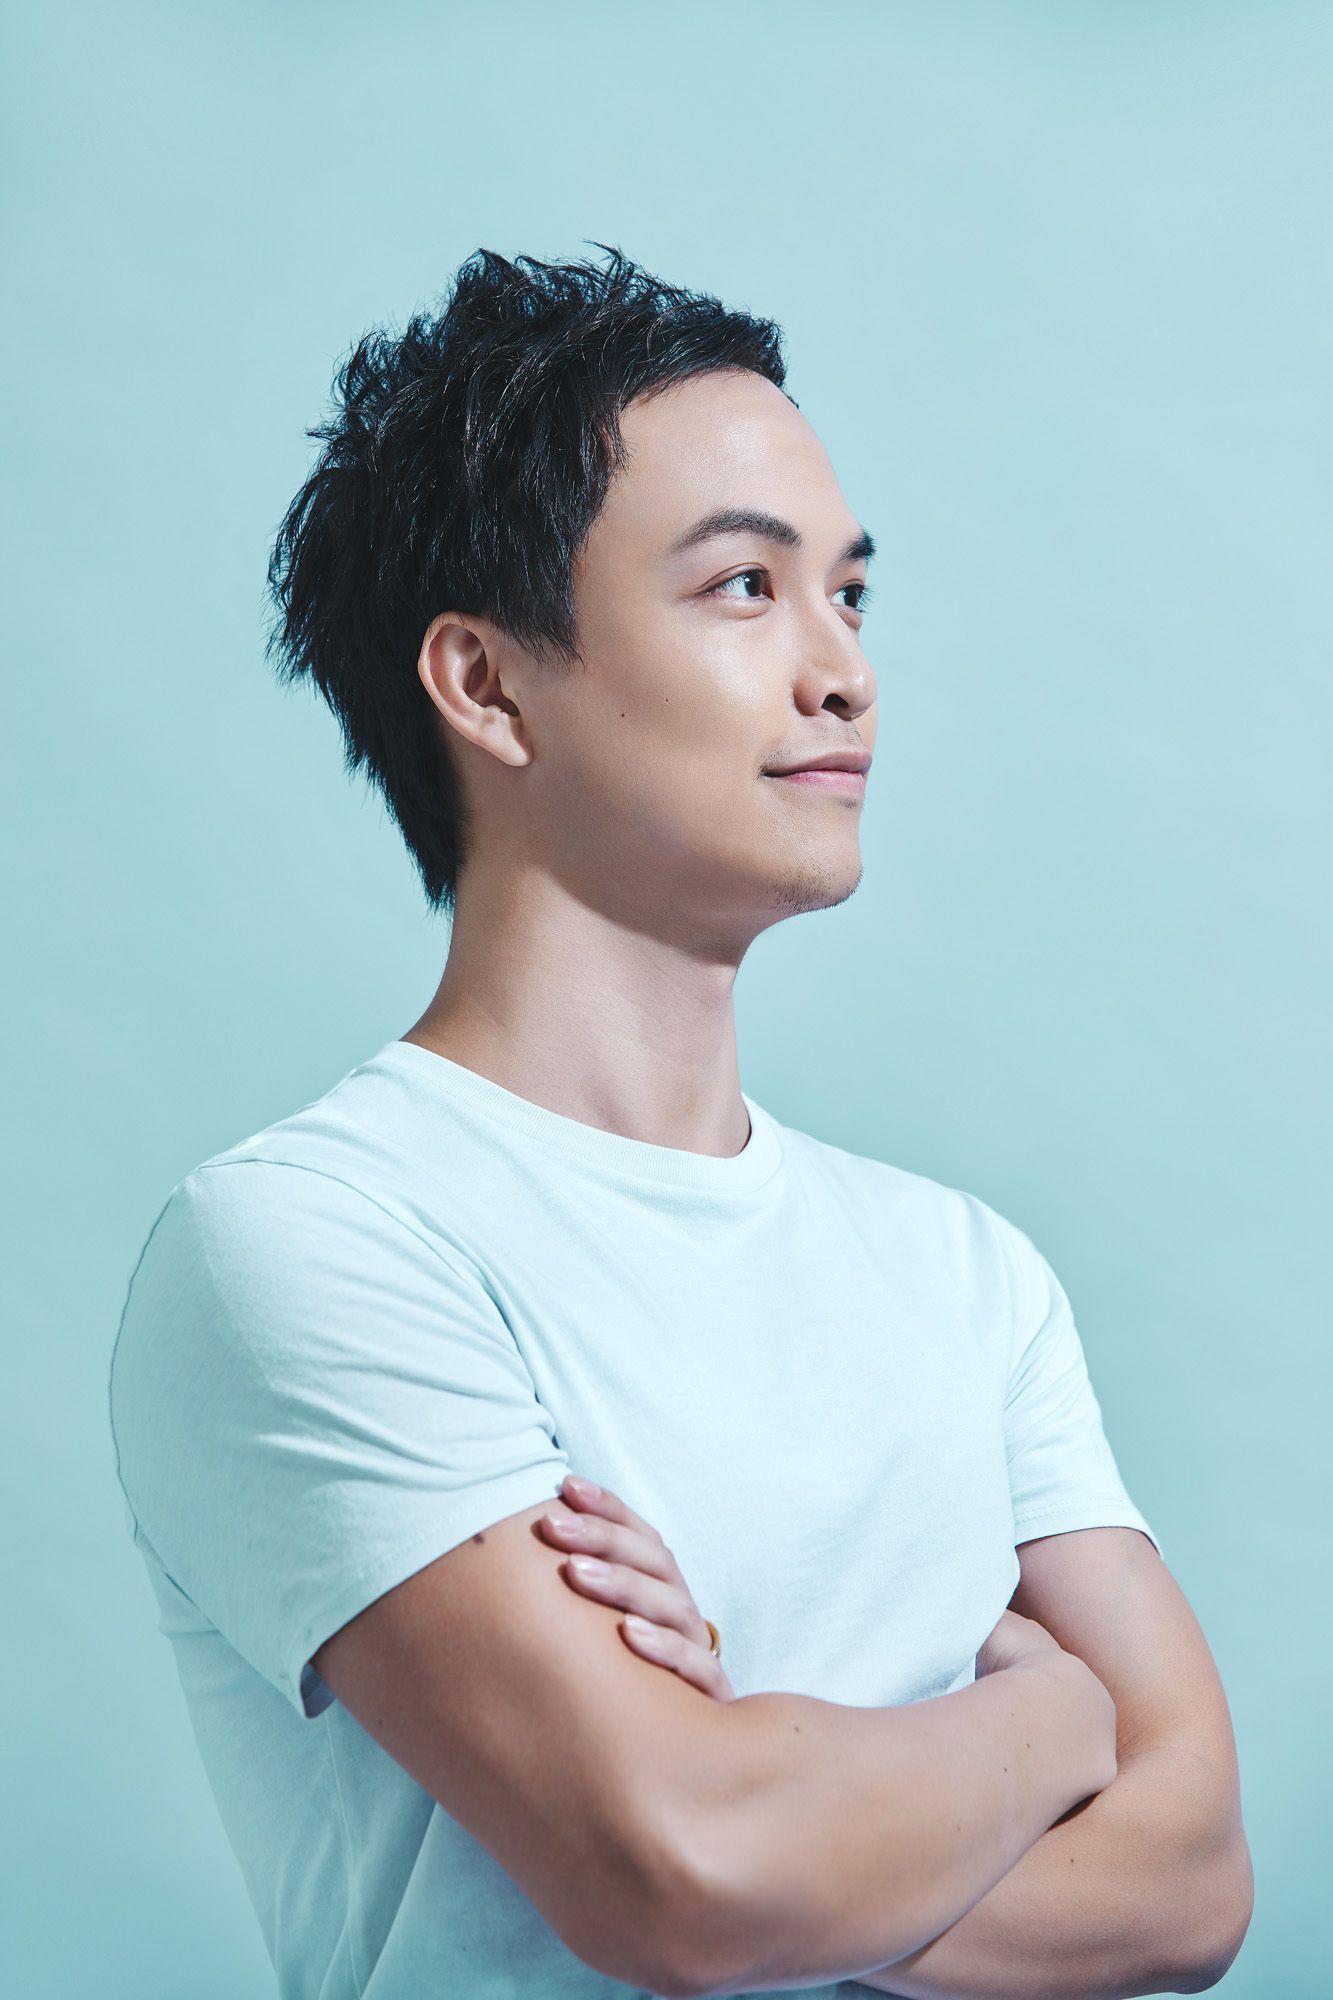 Alaric Choo